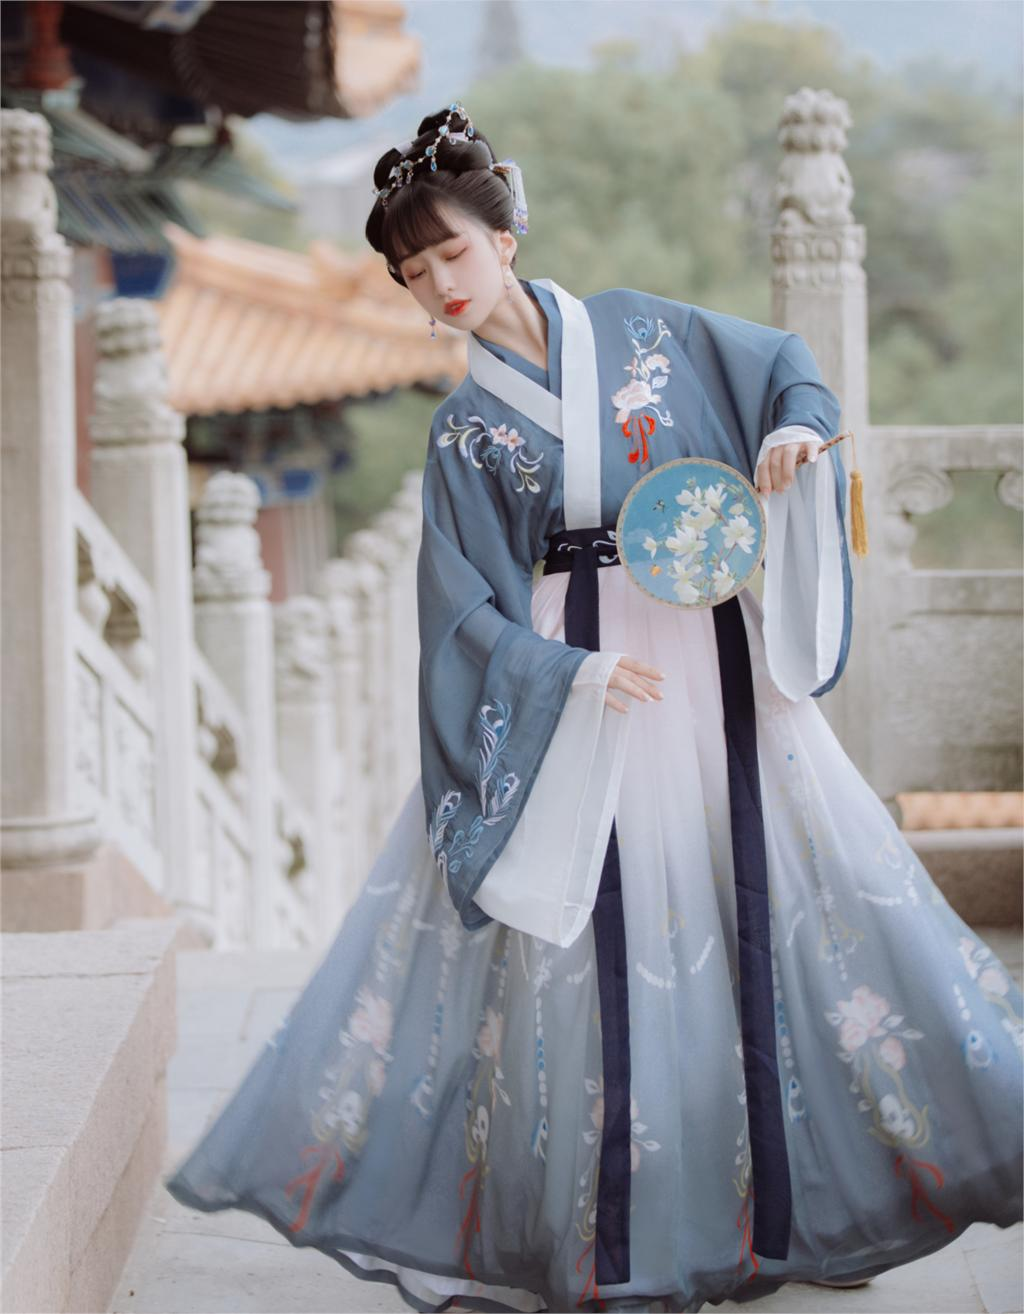 2020 Chinese Traditional Hanfu Dress Woman Elegant Dance Costumes Ancient Tang Dynasty Retro Cheongsam Year Photography Clothing